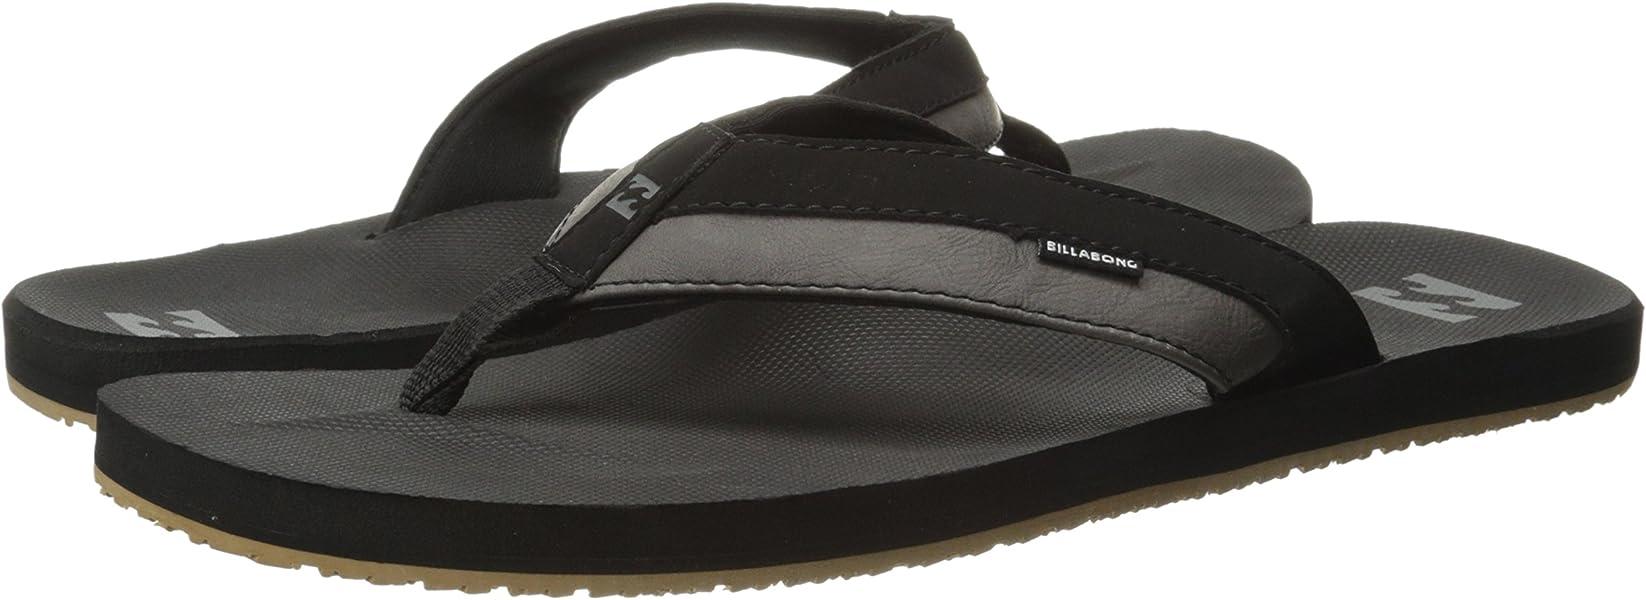 e74c212dbfe9 Amazon.com  Billabong Men s All Day Impact Sandals Black 8  Shoes